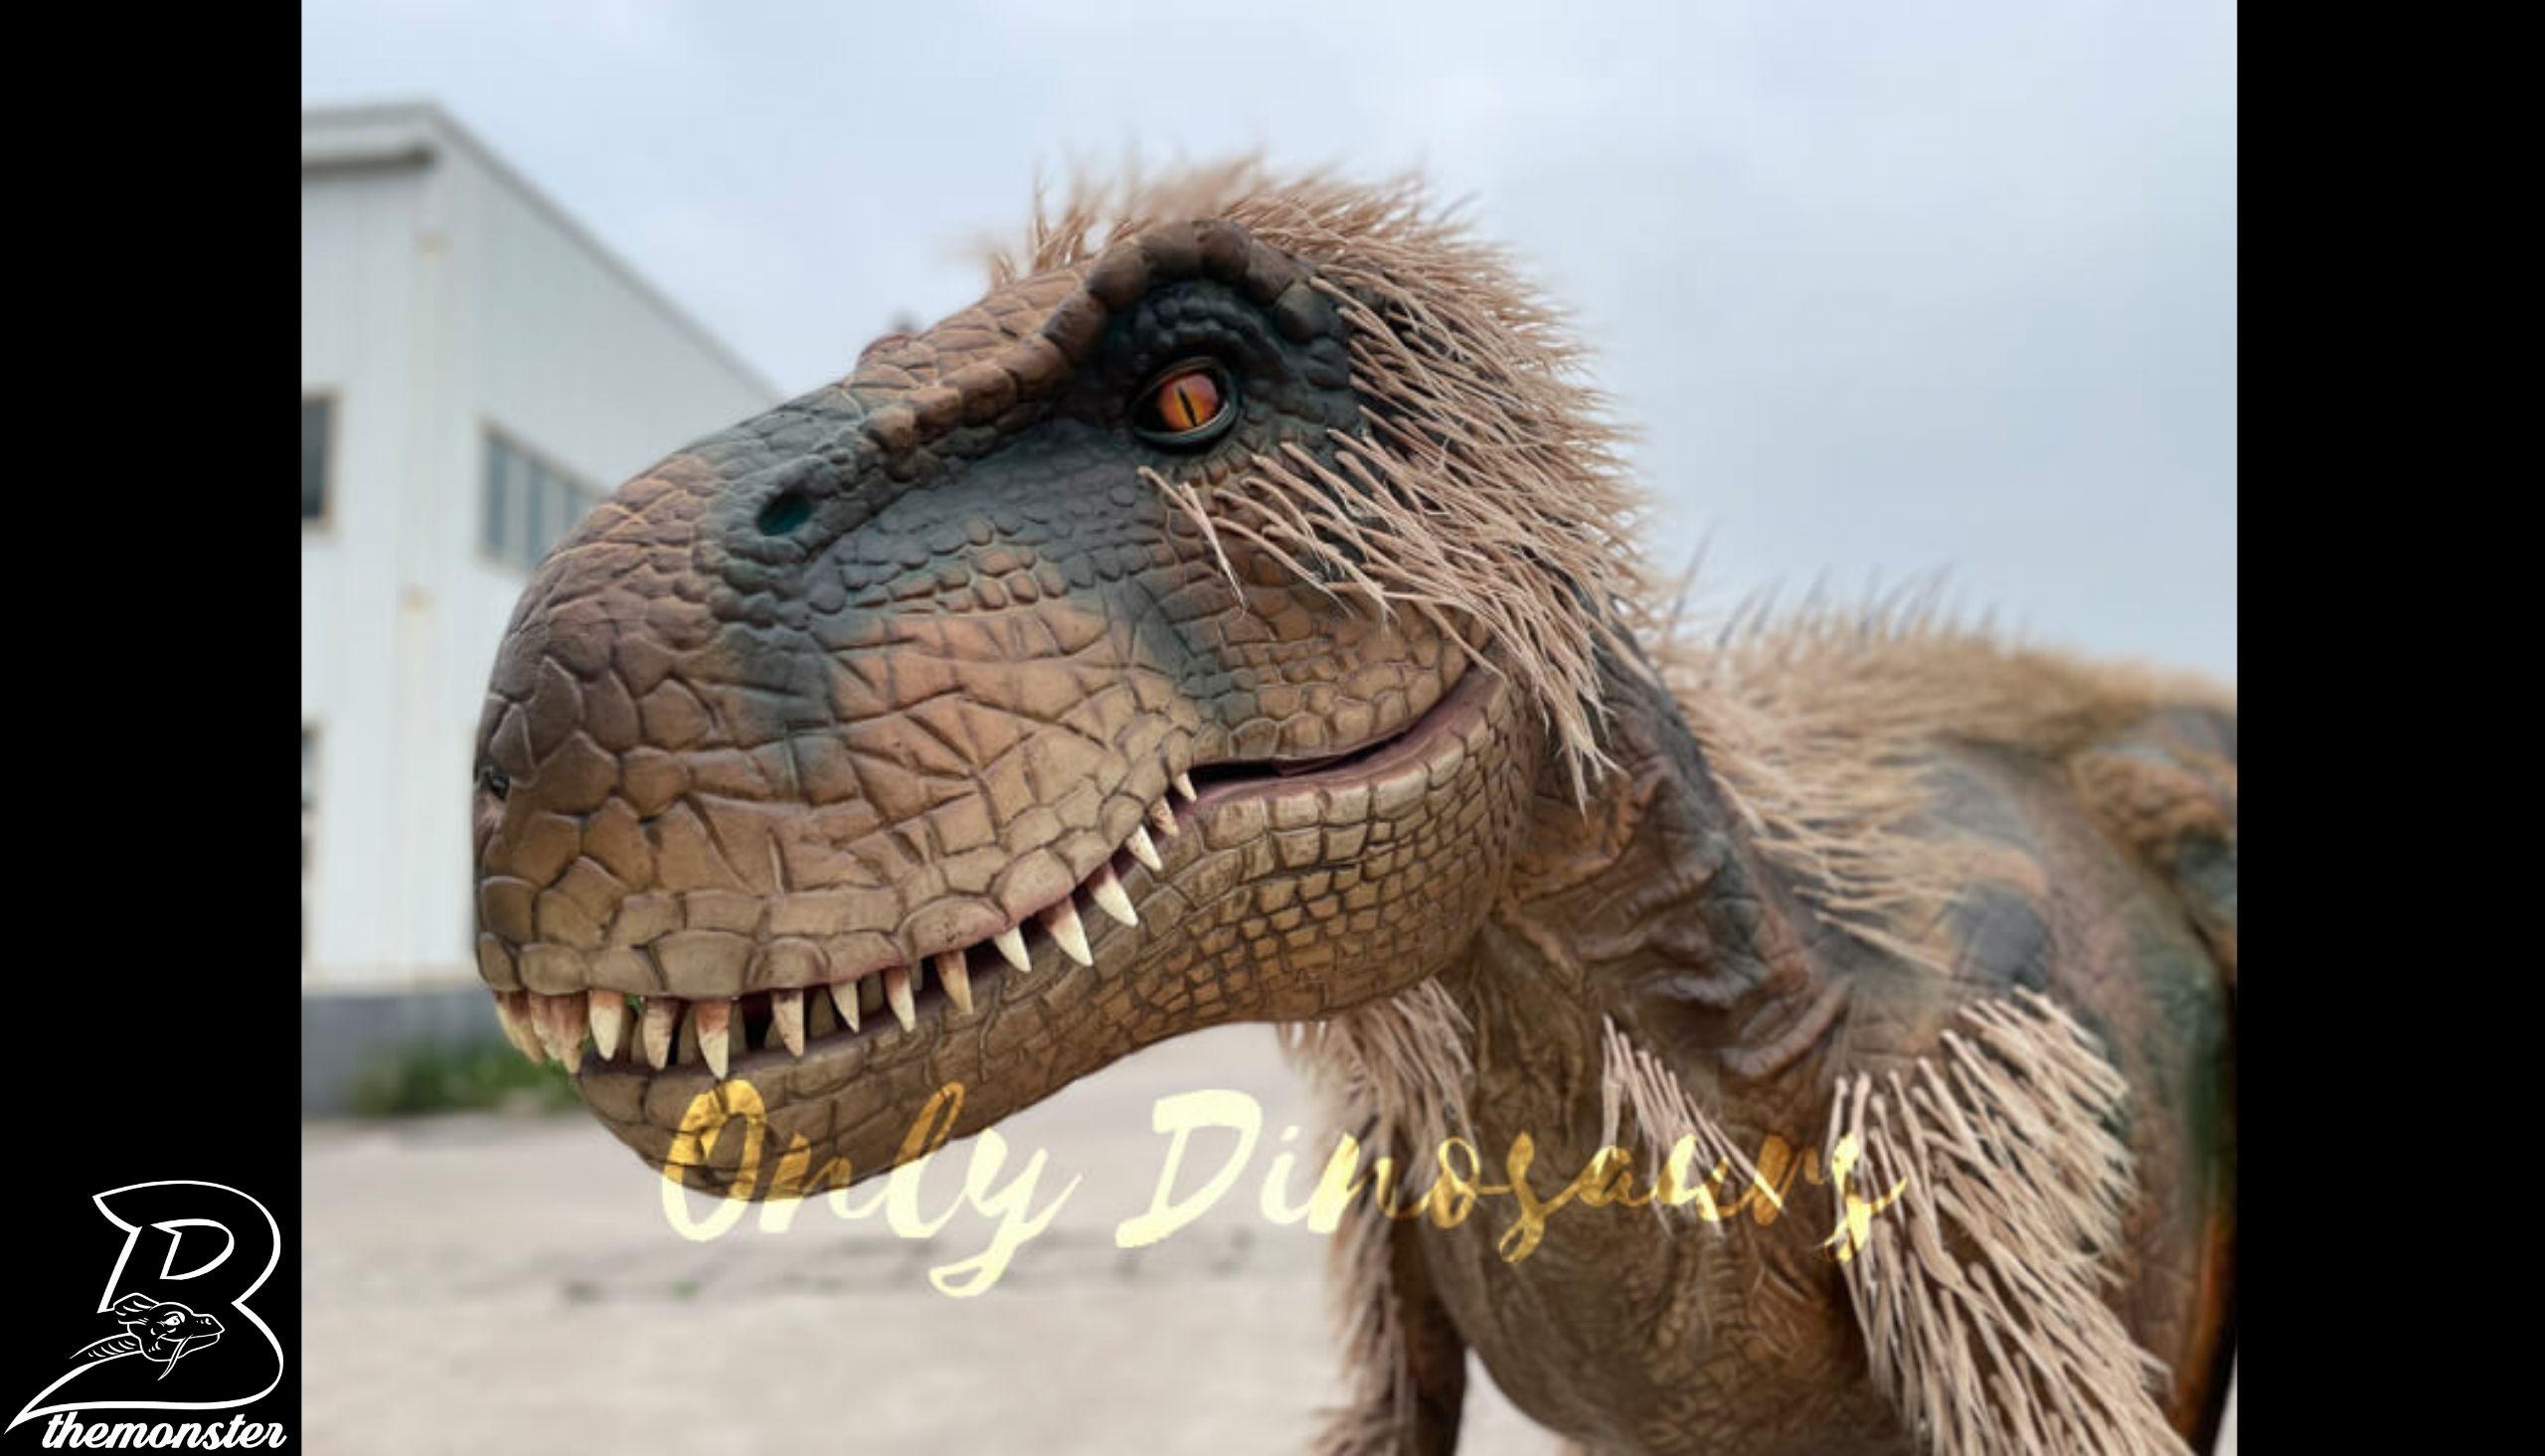 Feathered Visible Legs T-Rex Dinosaur Costume in vendita Bthemonster.com